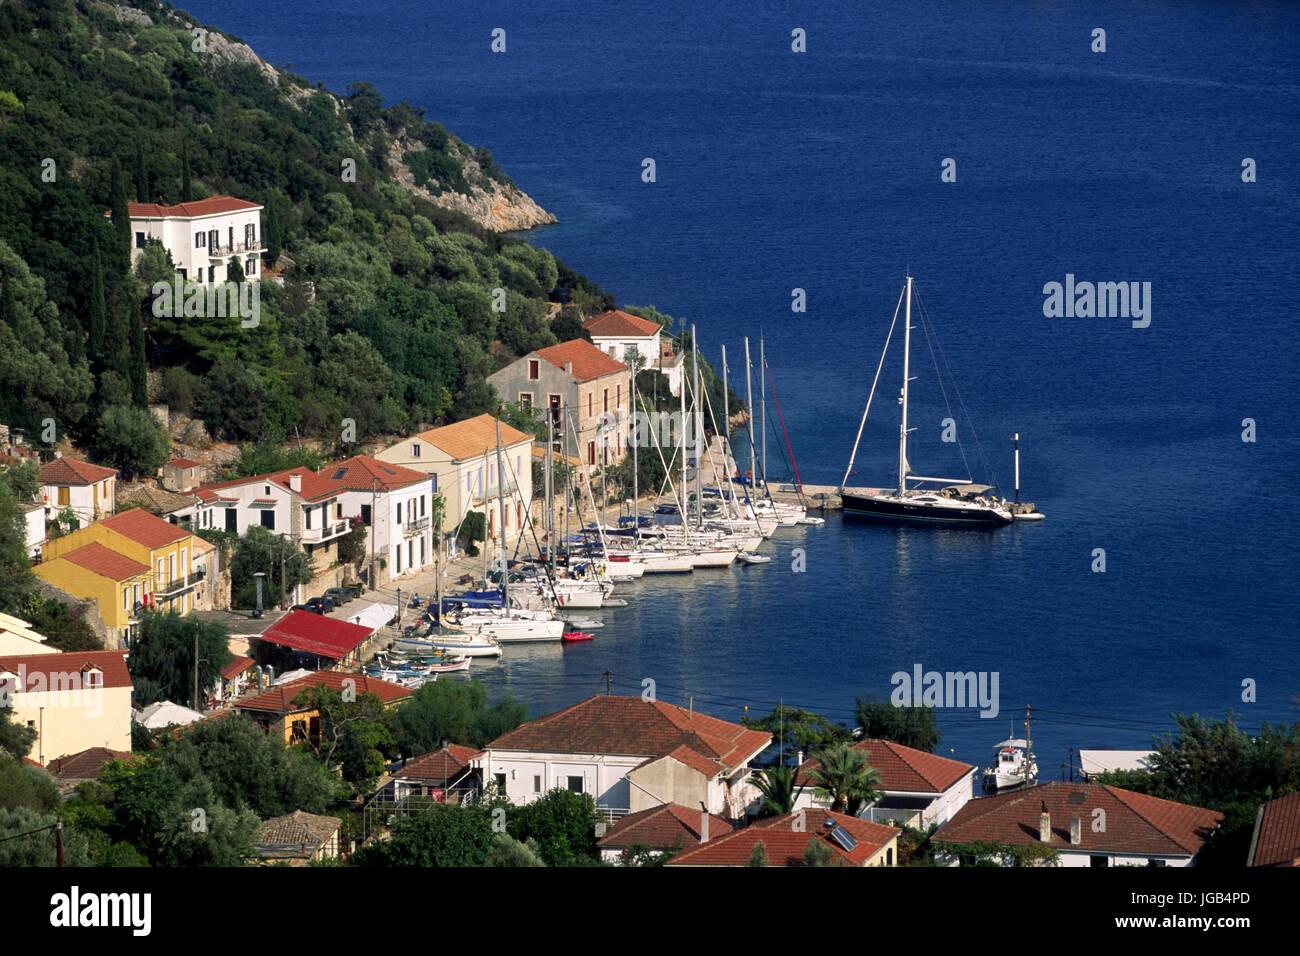 kioni, ithaca, ionian islands, greece - Stock Image